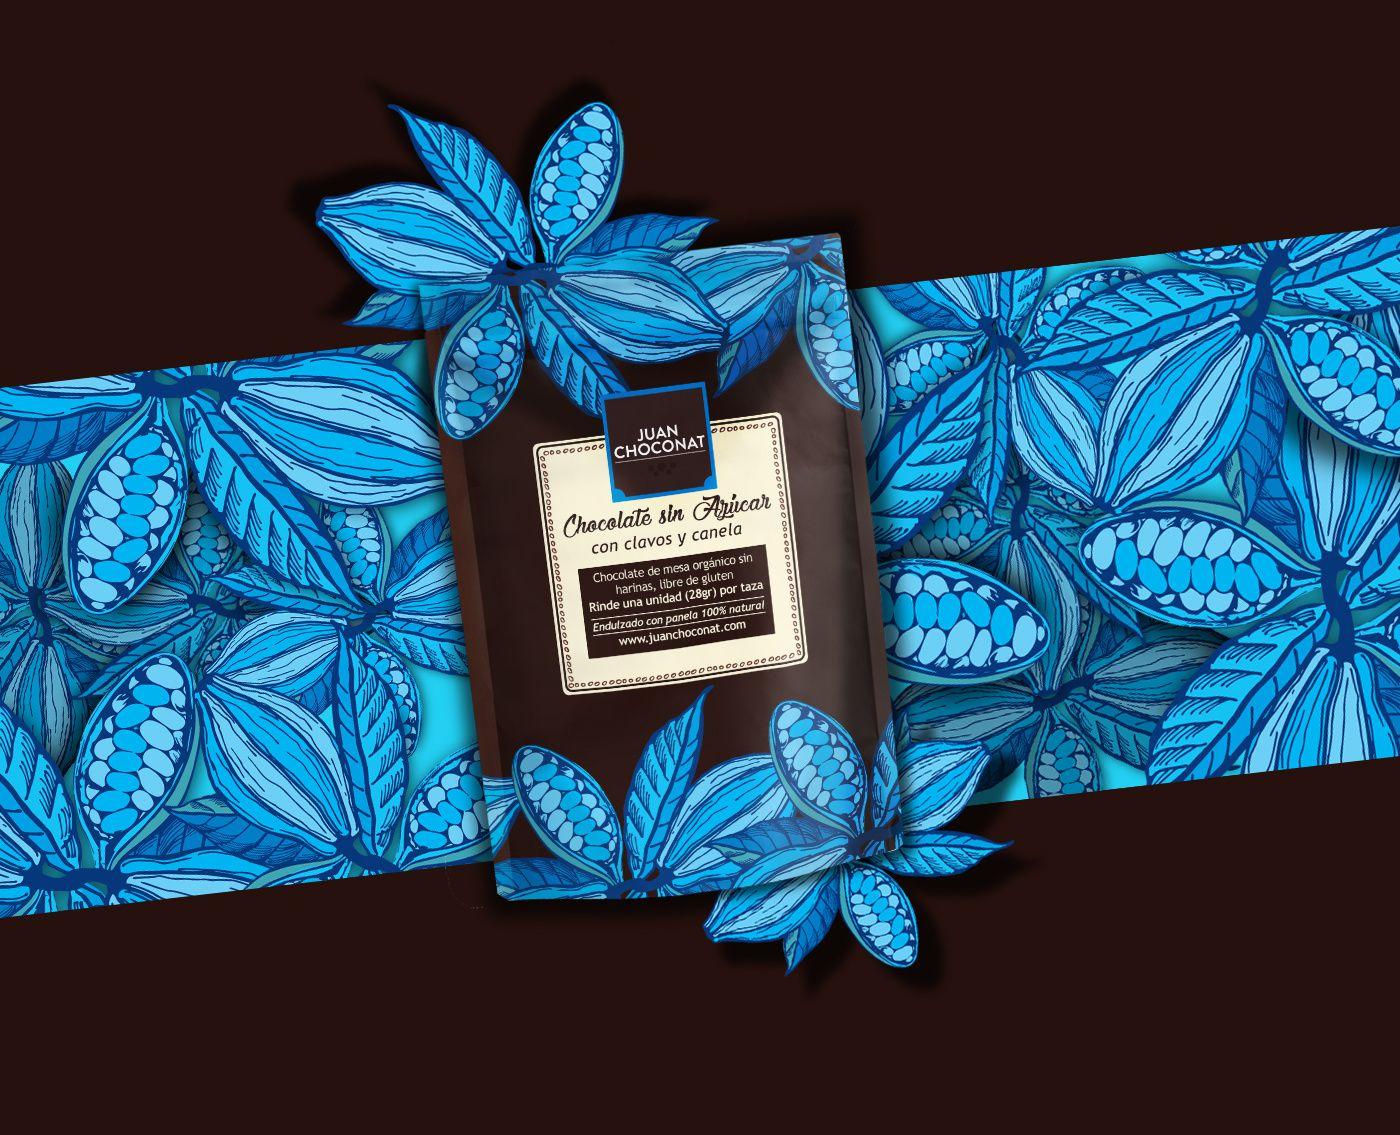 Juan Choconat (chocolat d'origine) I Design : Carlos Mauro Mendoza, Colombie (septembre 2017)